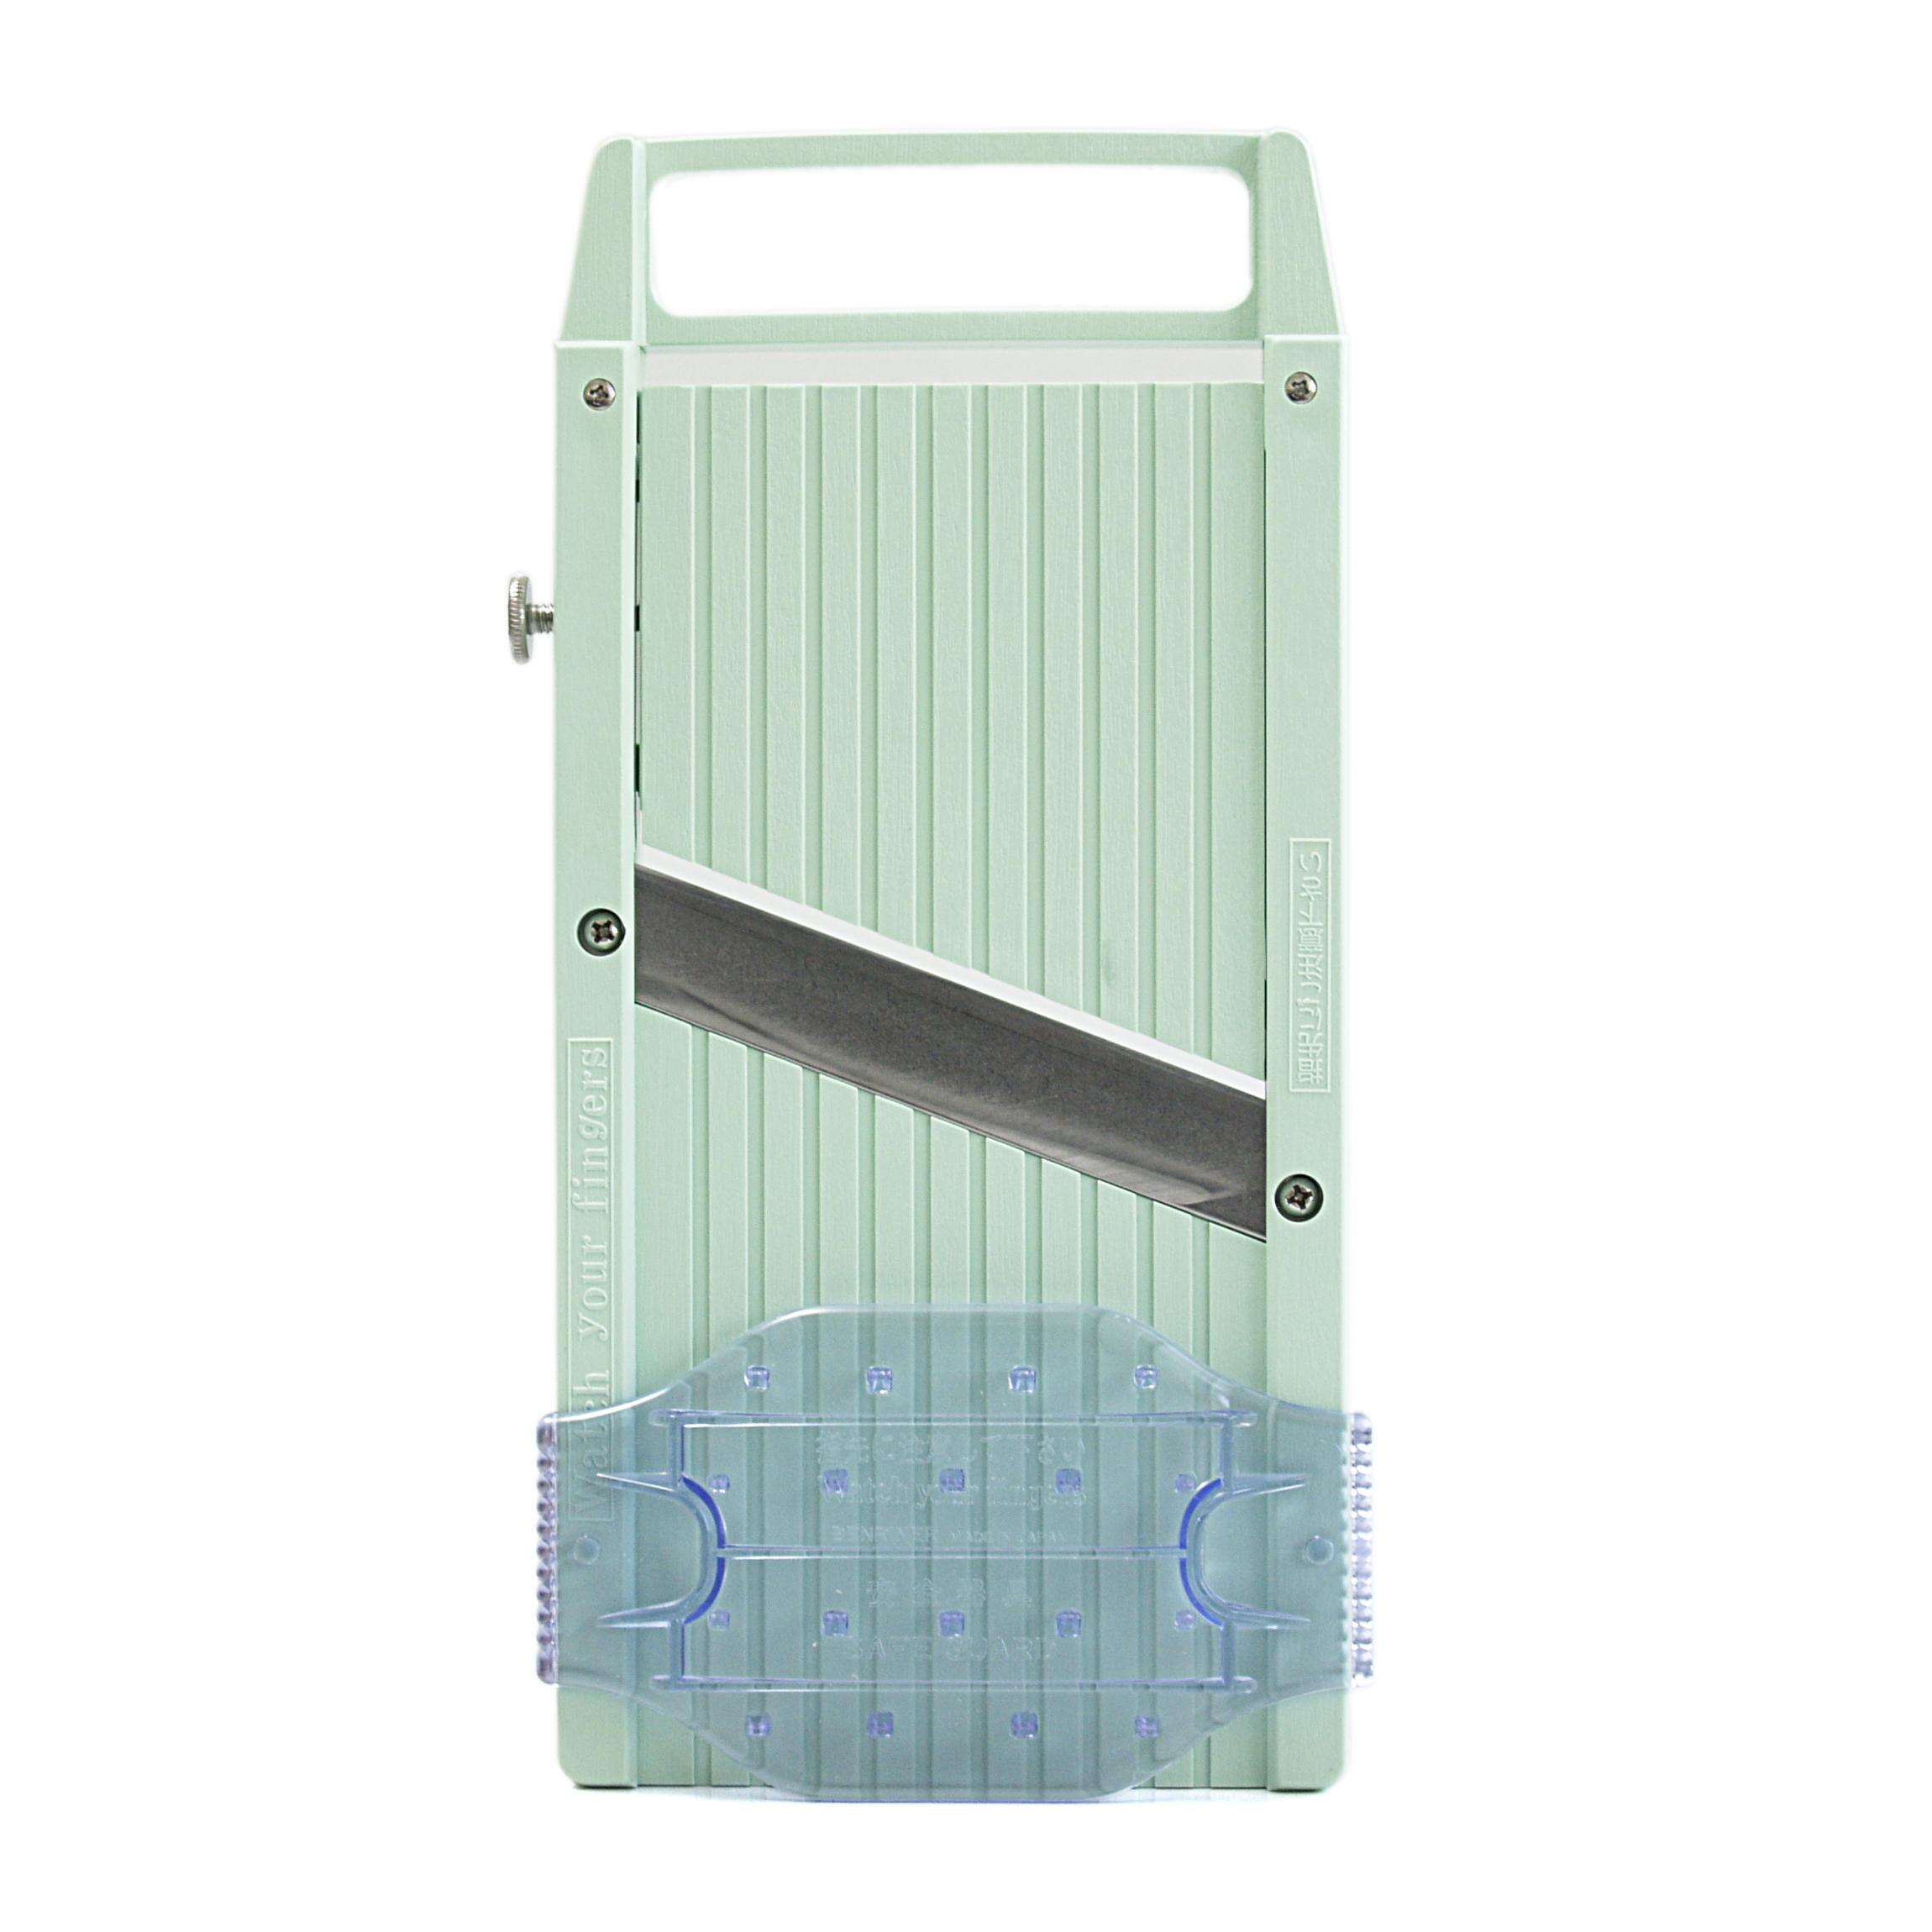 Benriner Mint Green Stainless Steel Mandoline Slicer